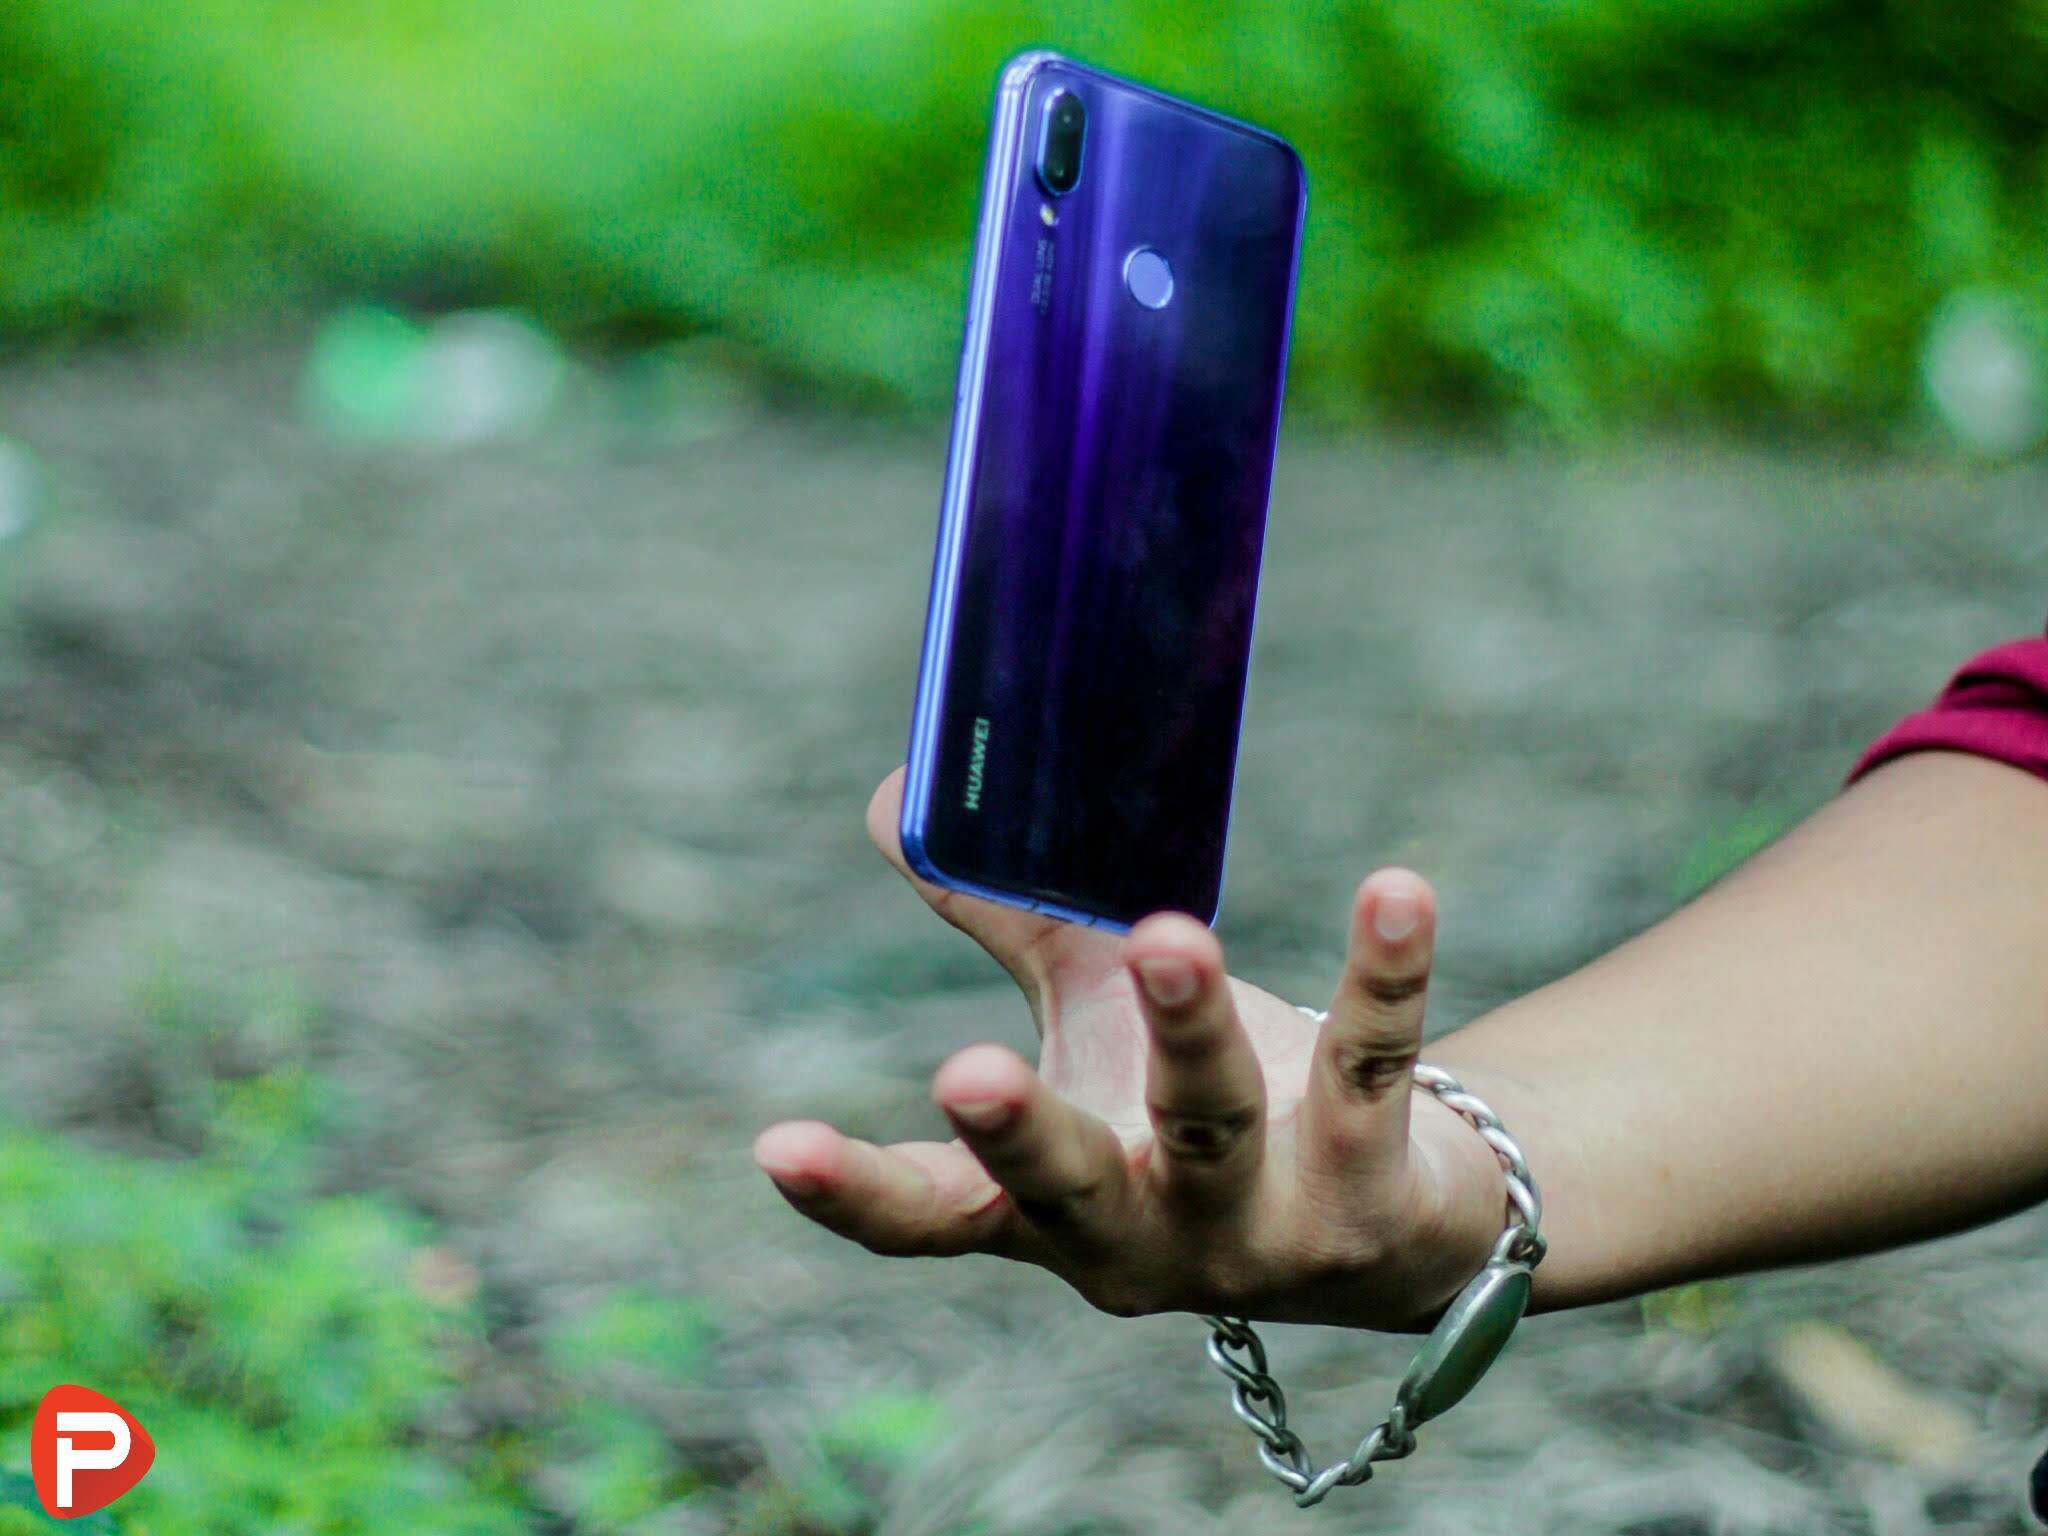 Huawei Nova Huawei Nova 3i Initial Impressions & Hands on Review